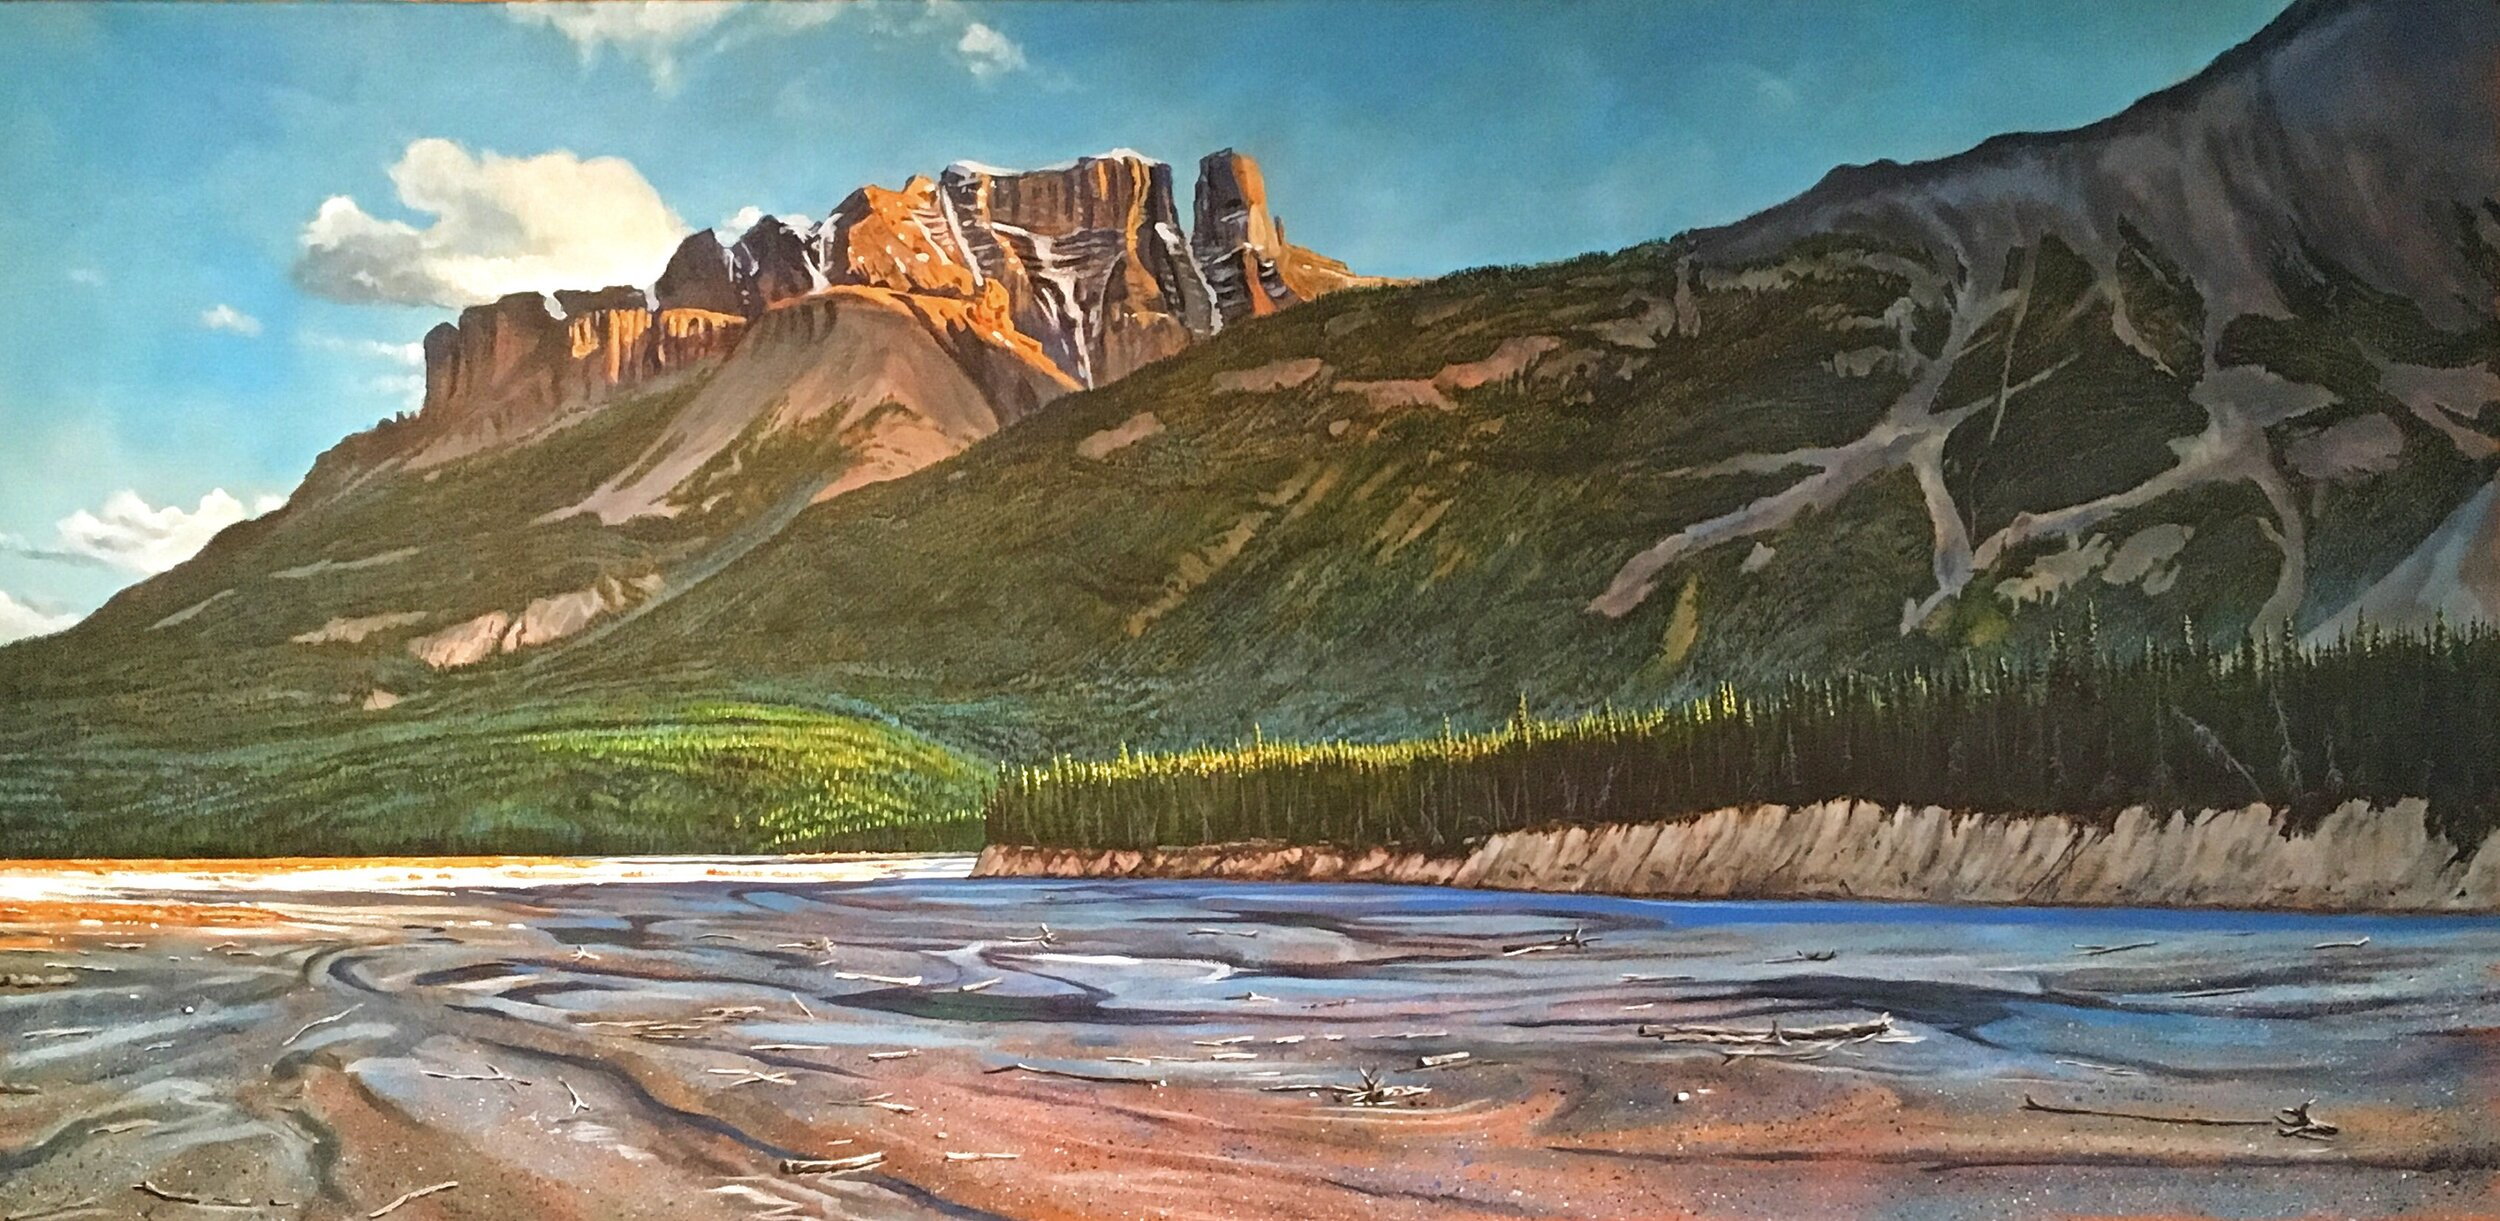 Chuck Burns,  River Flats,  2018, acrylic on canvas, 24 x 48 inches framed